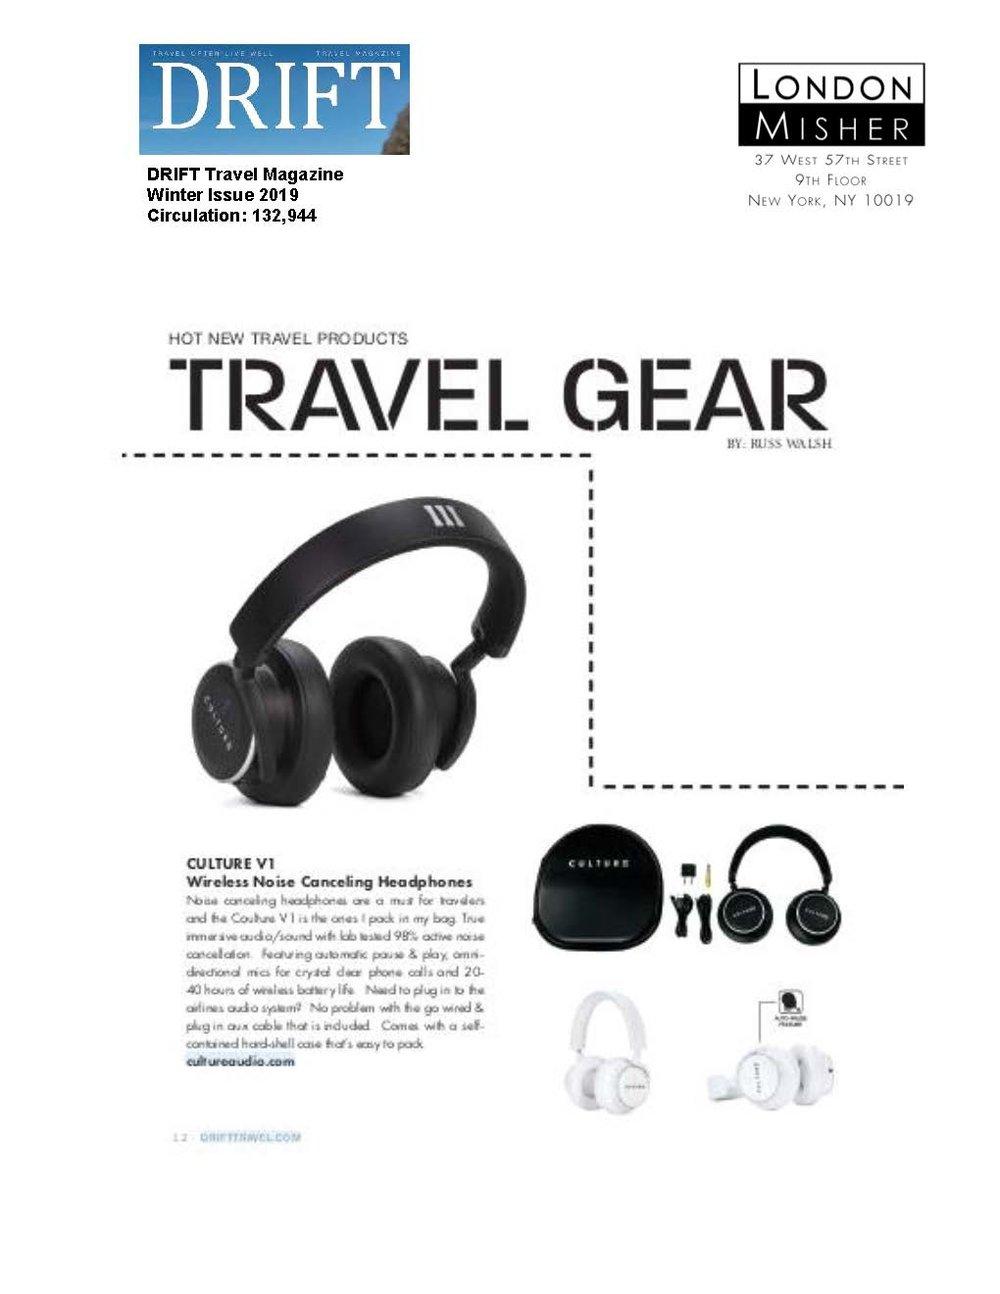 DRIFT Travel Winter 2019_Page_1.jpg